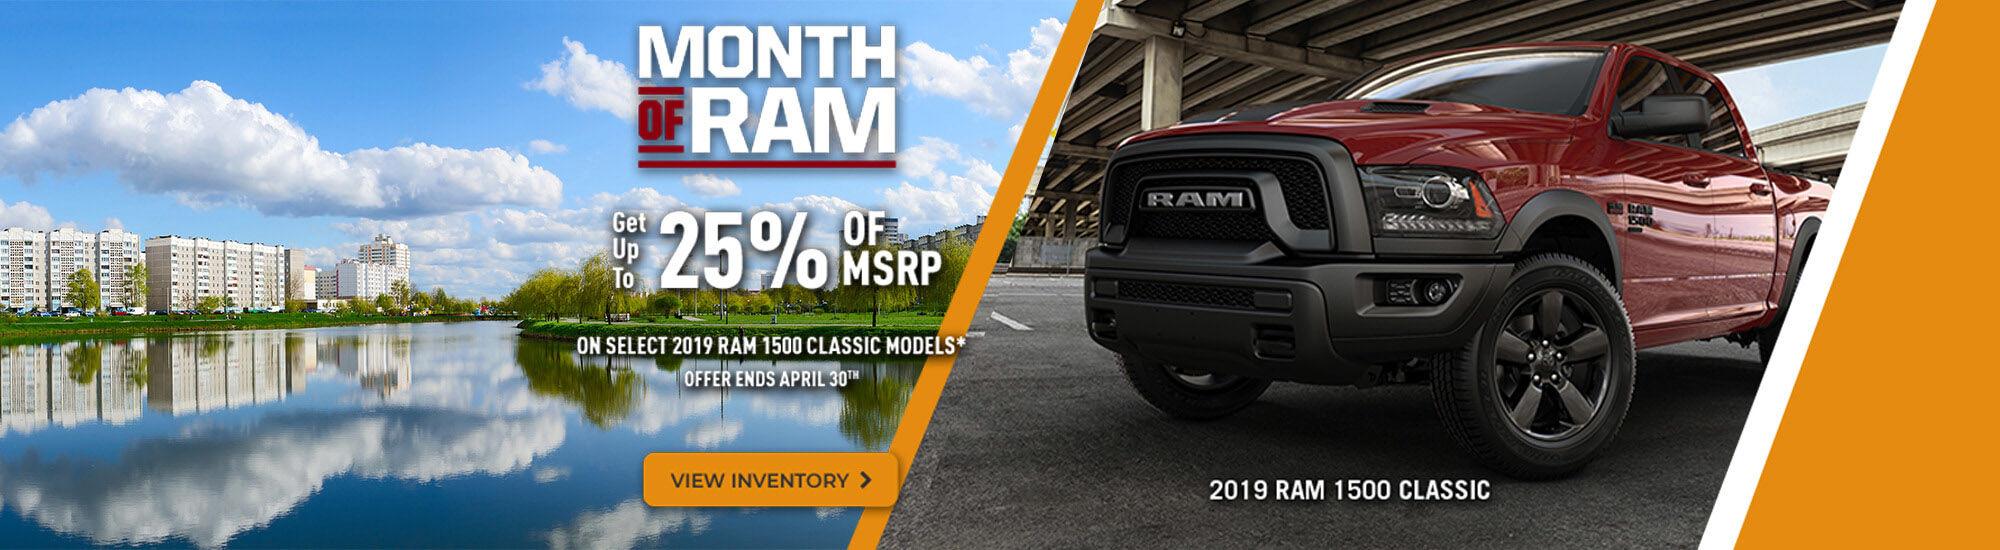 Ram month of Ram